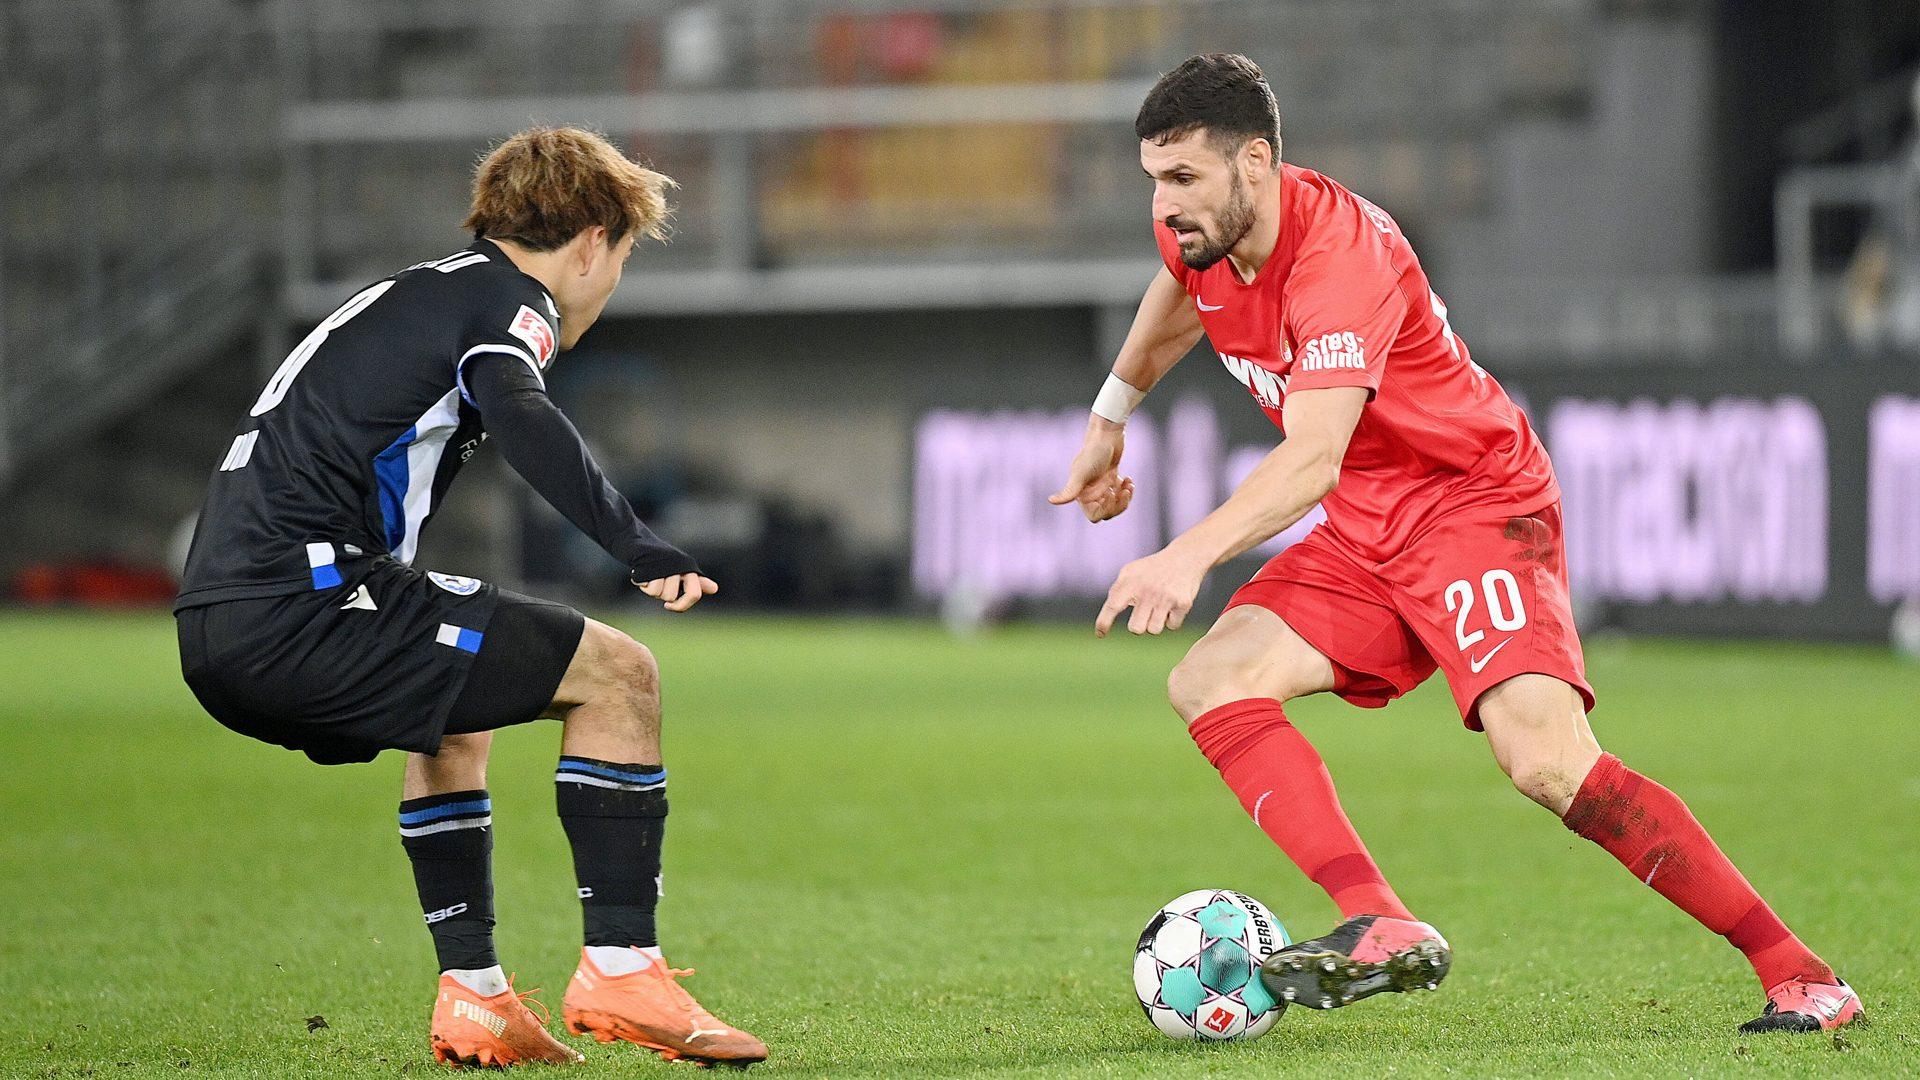 Augsburg vs Arminia Bielefeld: Prediction, Lineups, Team News, Betting Tips & Match Previews